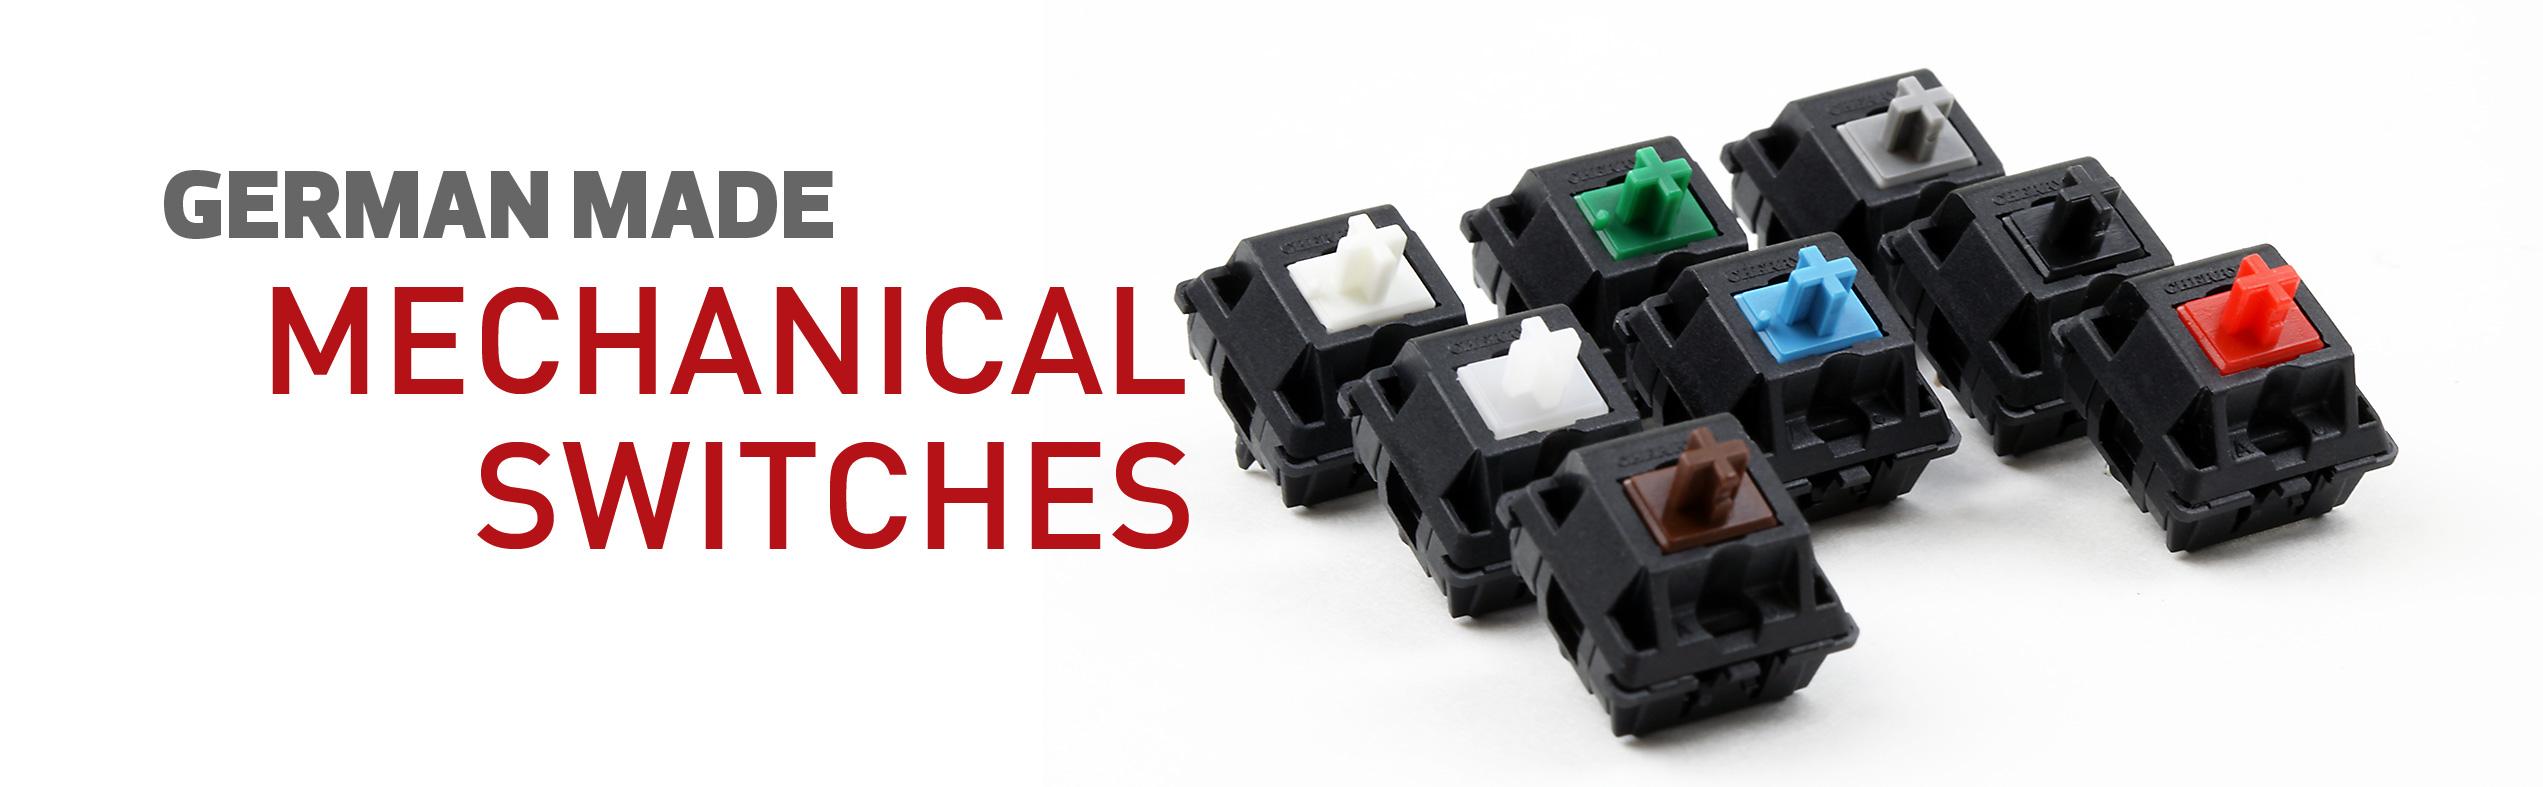 Max Keyboard Cherry MX Mechanical Switches